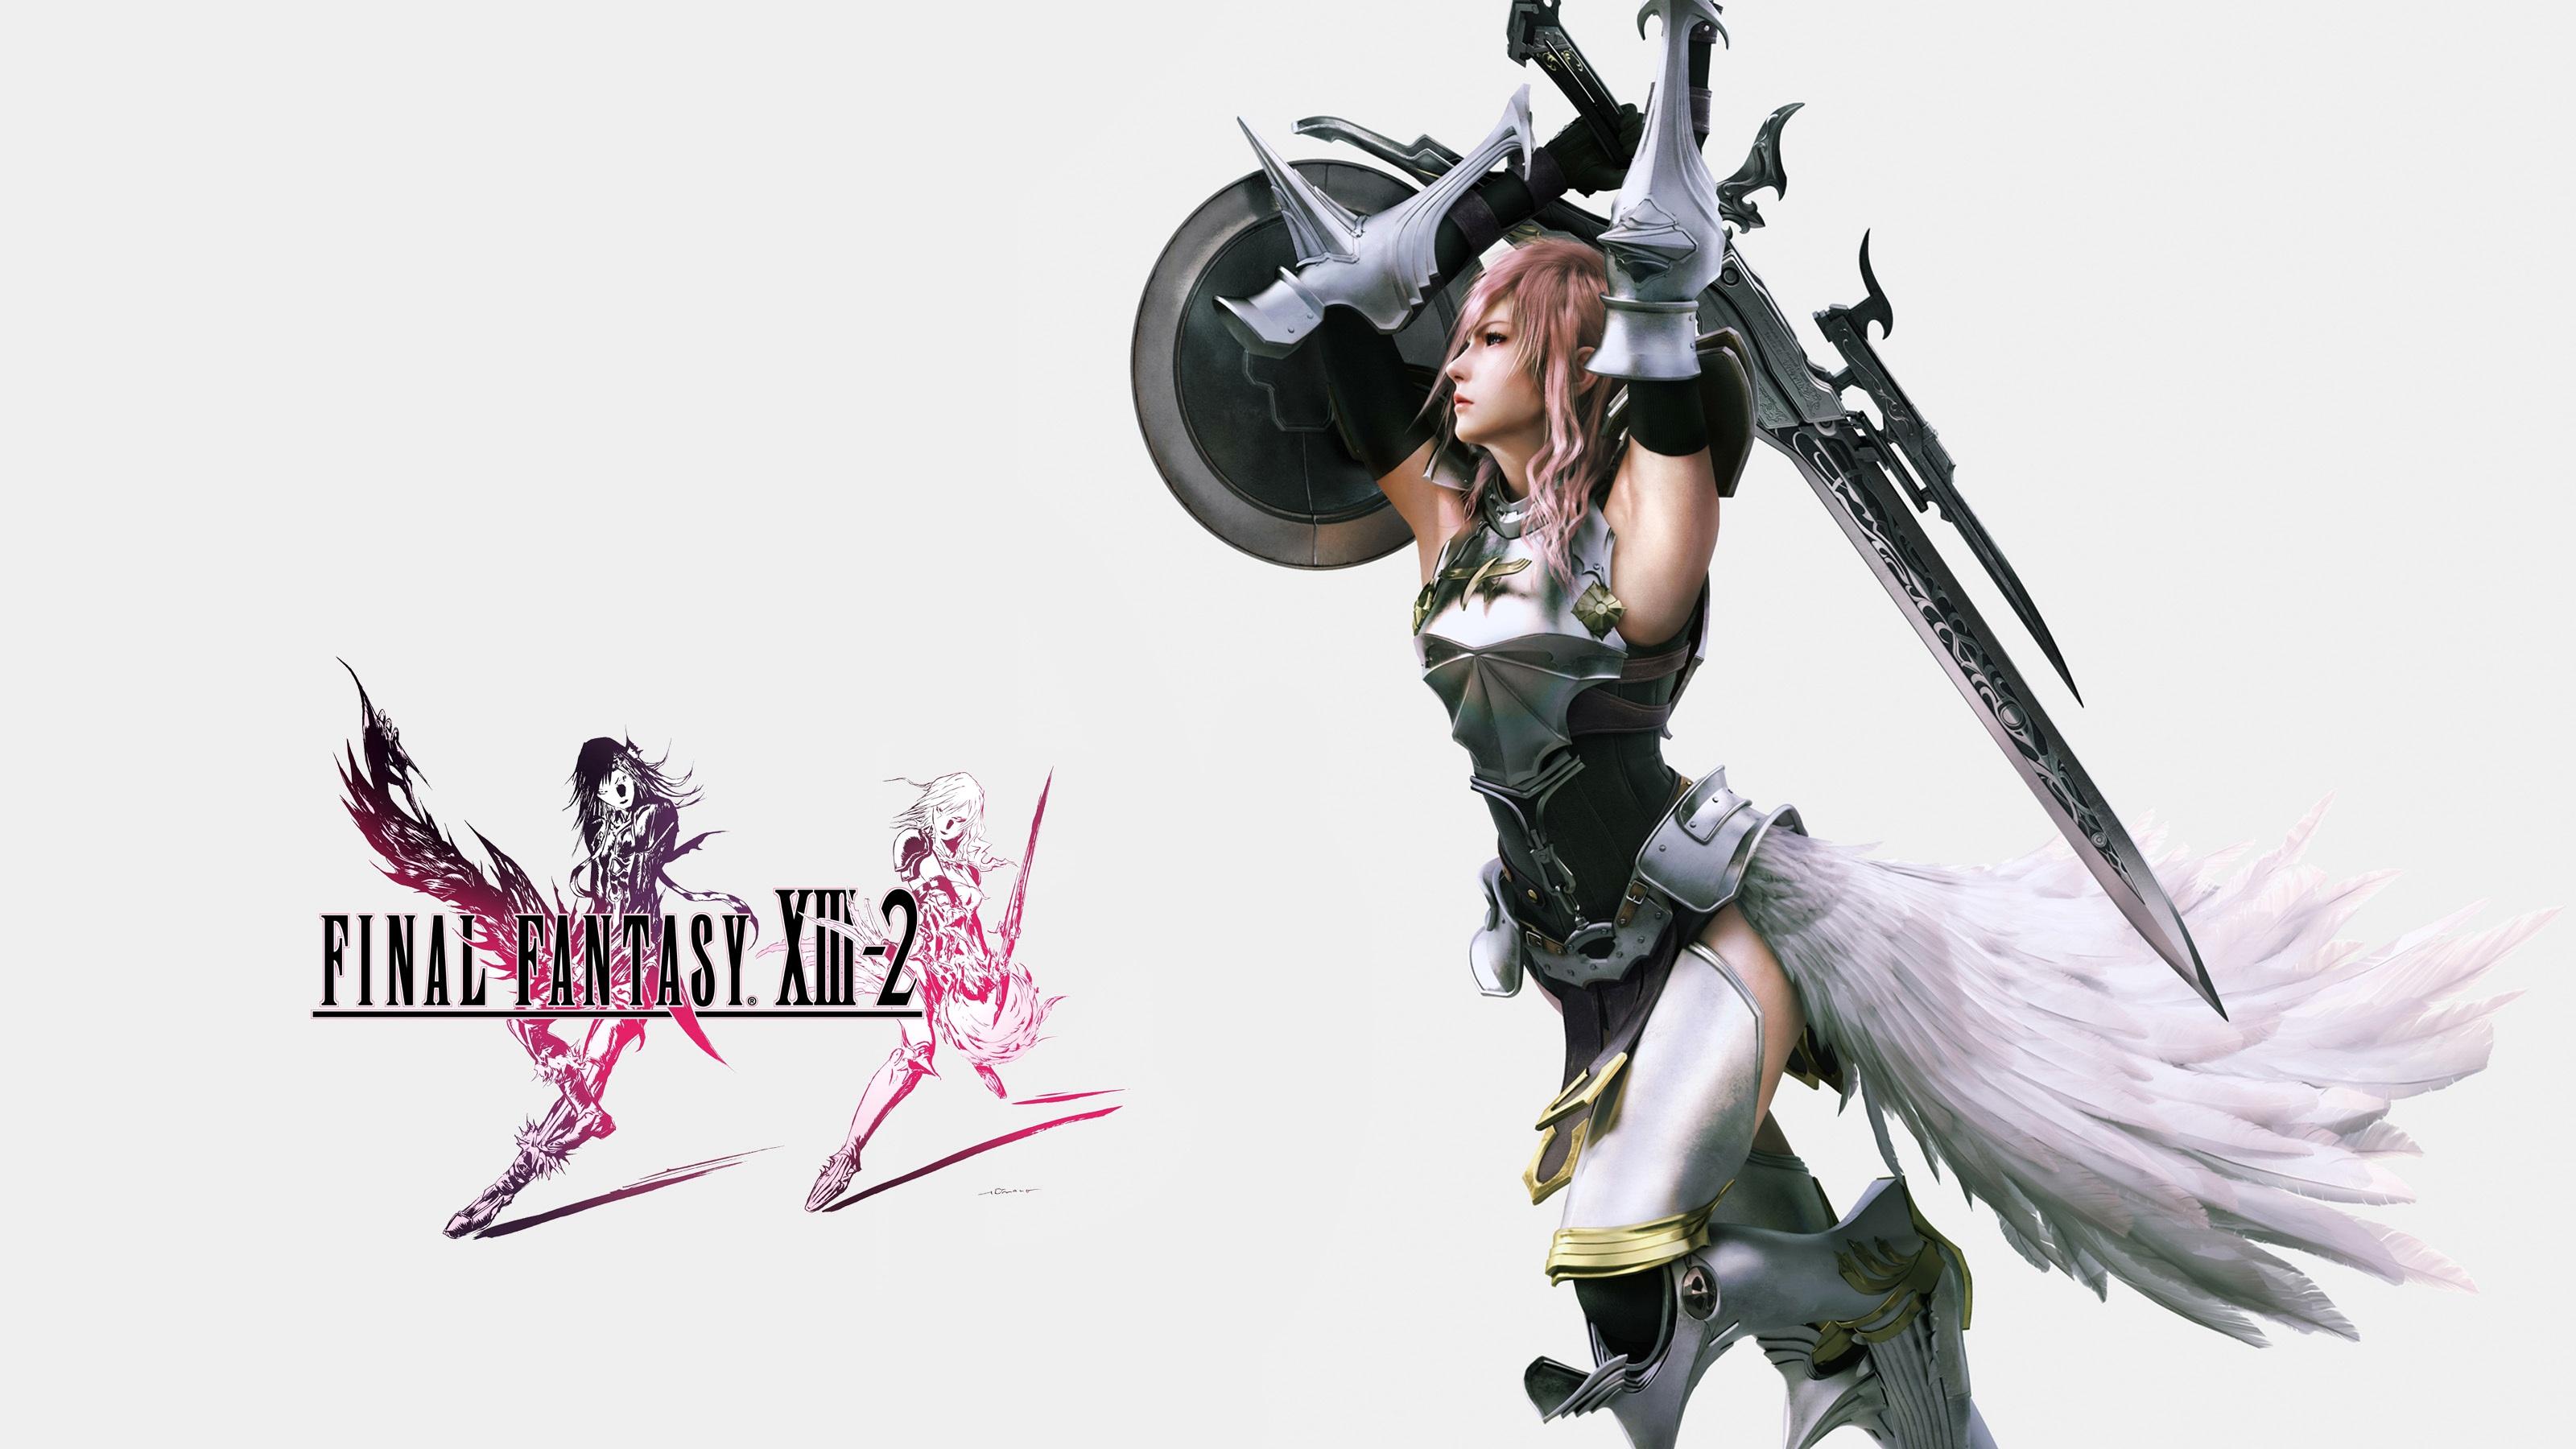 Final Fantasy Xiii 2 Lightning Wallpapers Wallpapers Hd